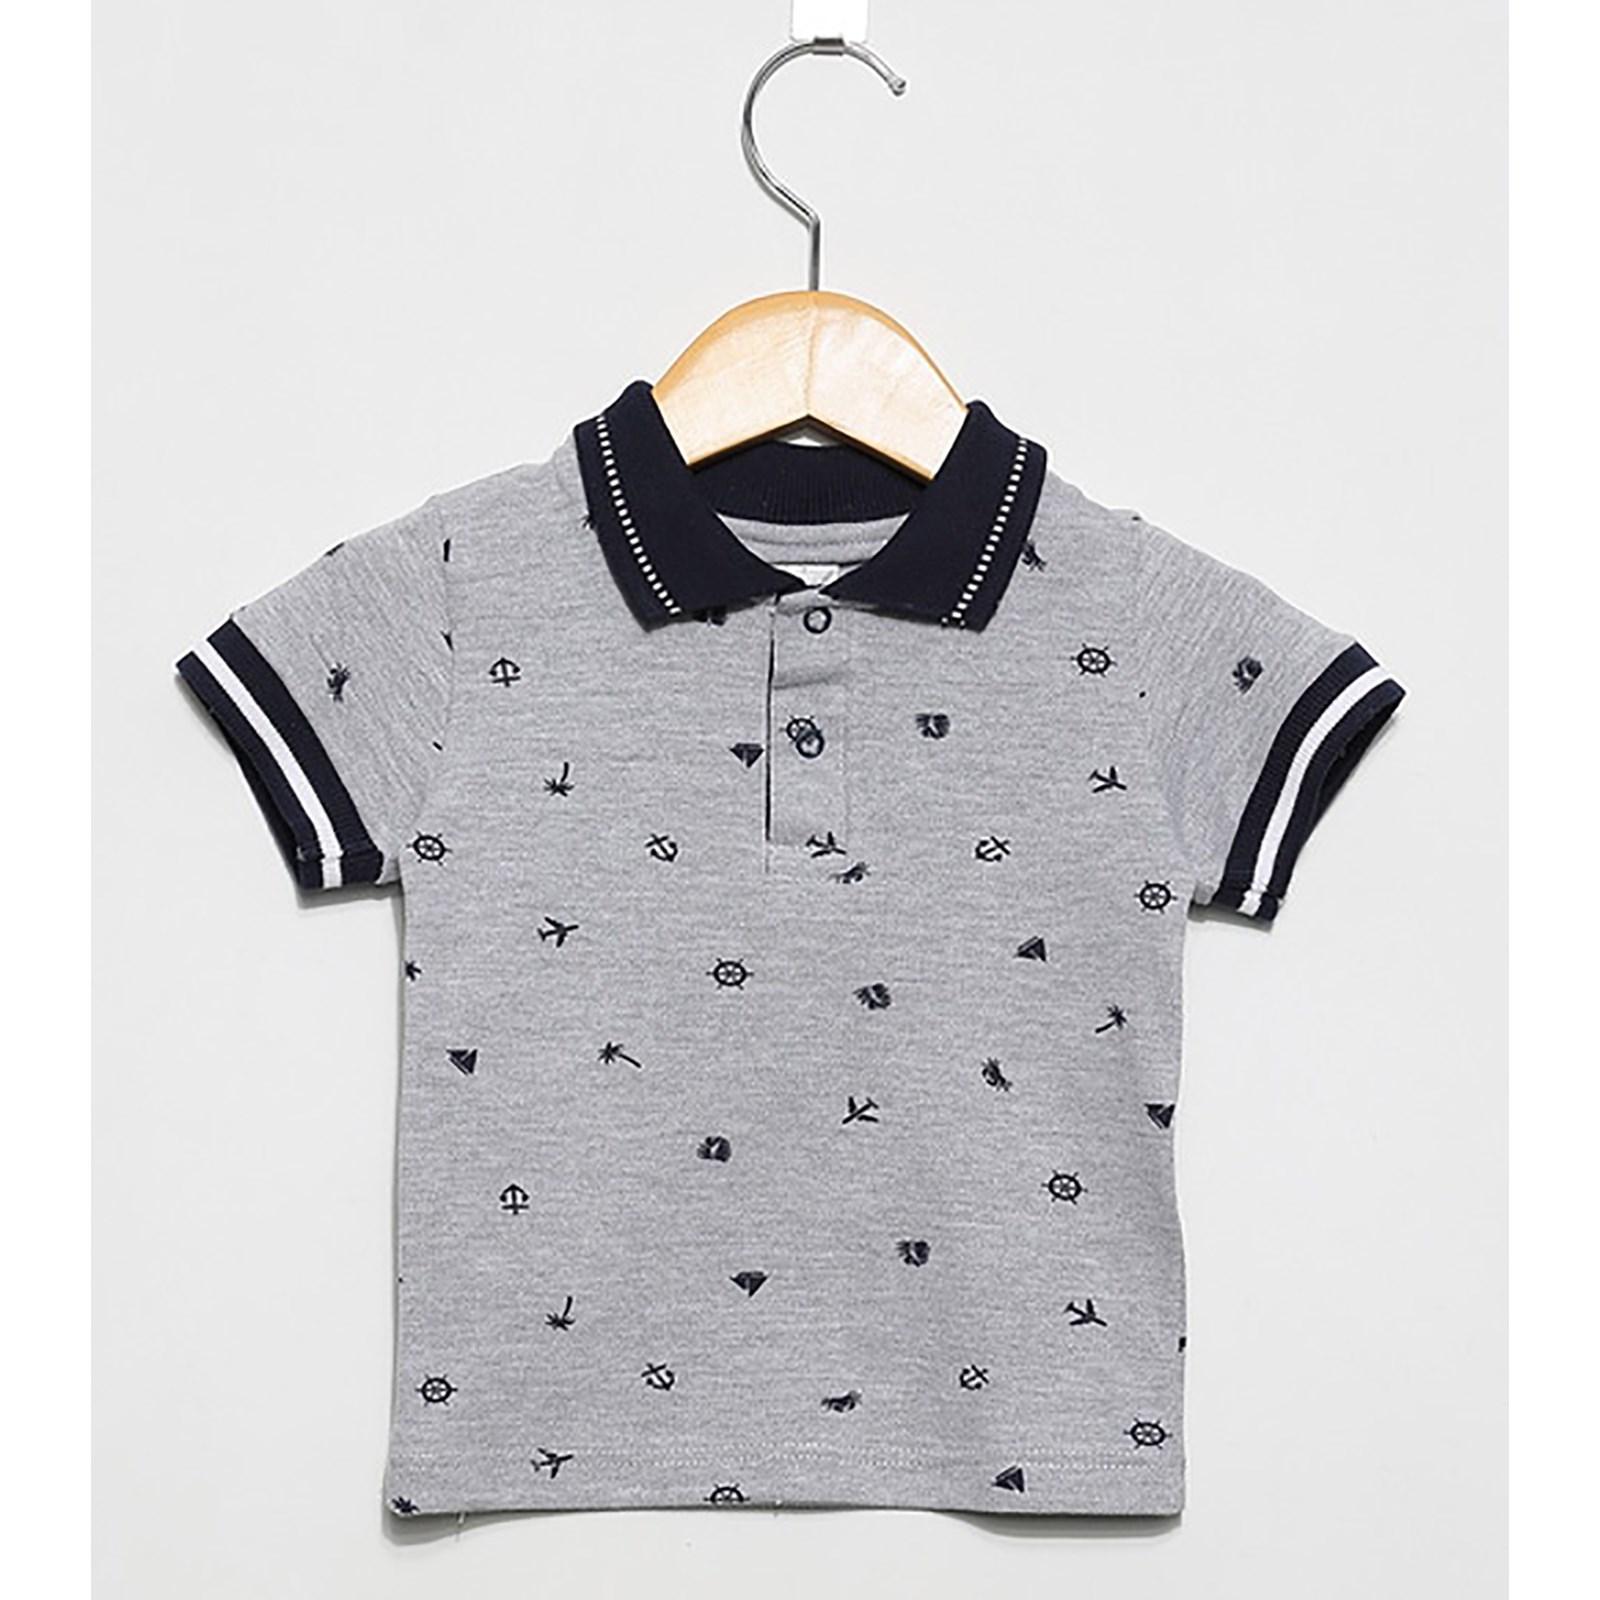 ed6c6f967 Camisa Polo Marinheiro Cinza - Tamanho P